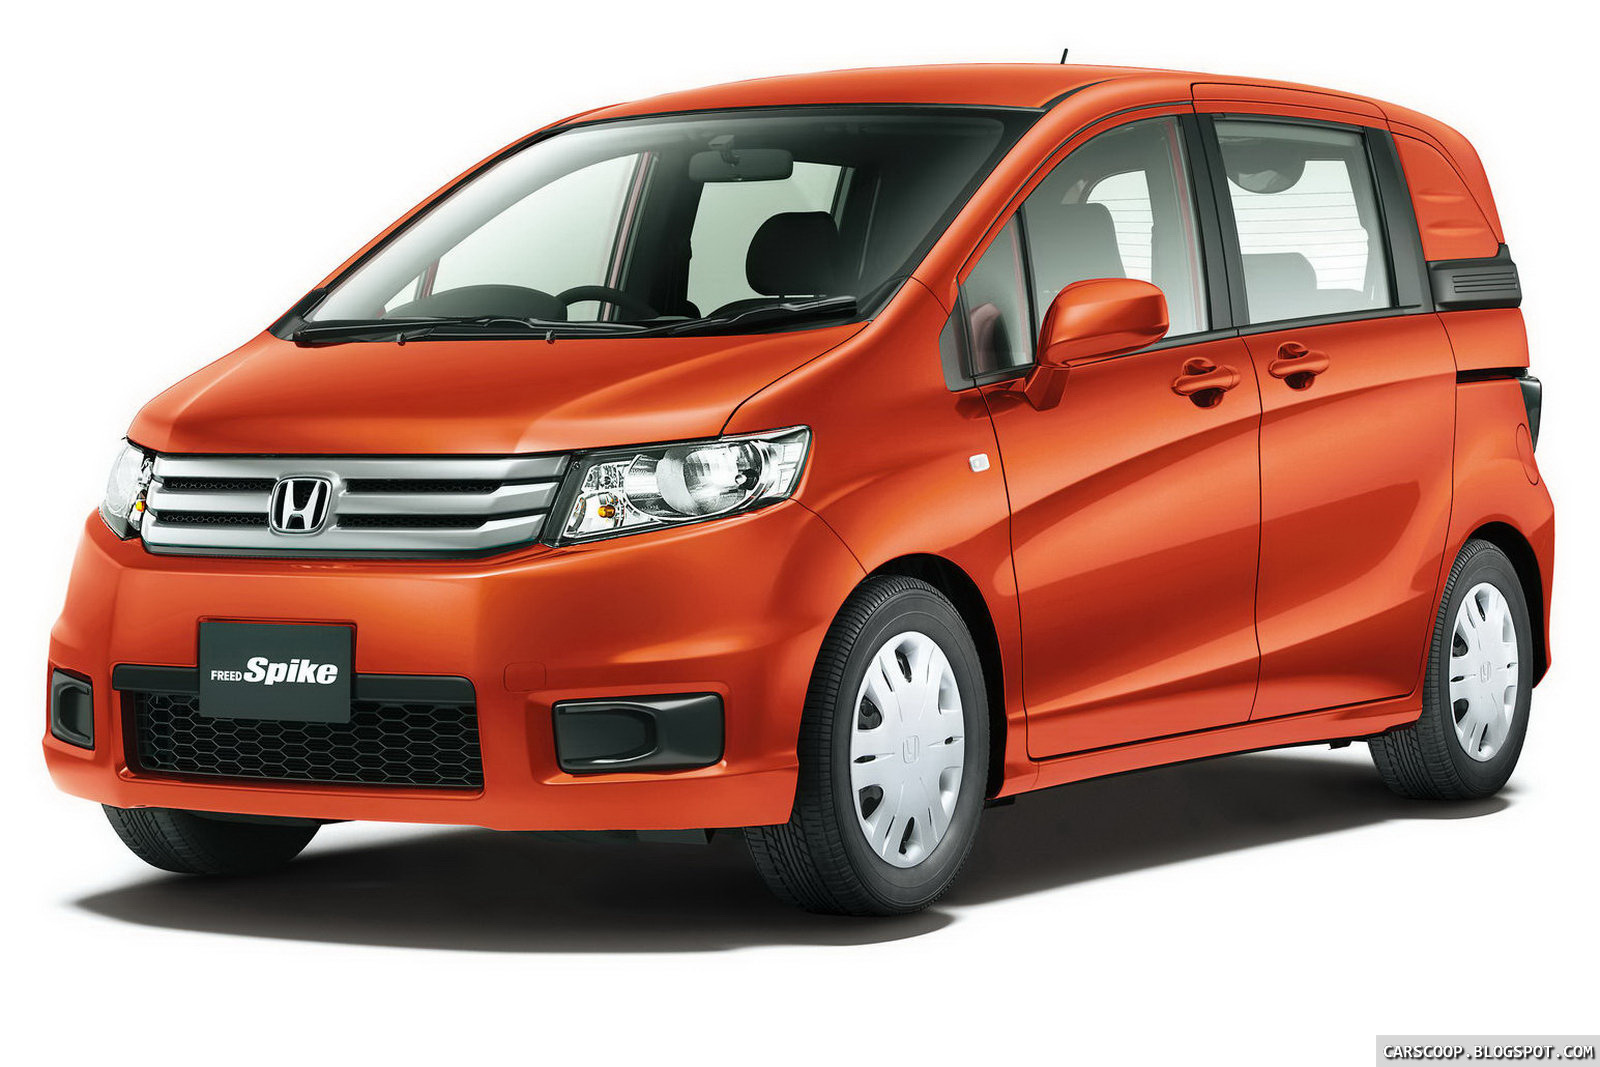 "New Mercedes Minivan >> Carscoop: New Honda Freed Spike ""Lifestyle"" Minivan Debuts in Japan"